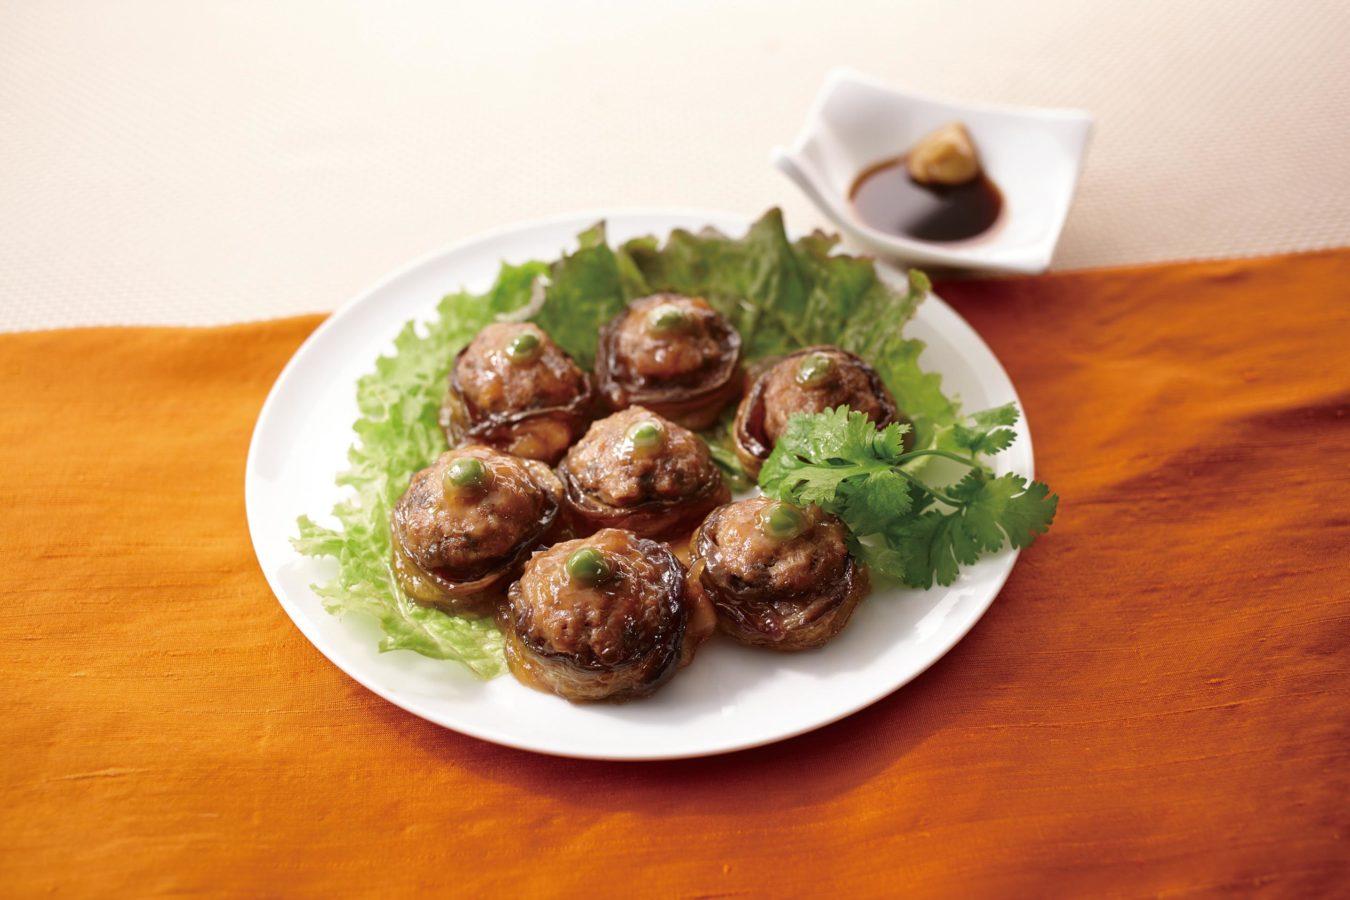 Eggplant Shumai (Dumplings)